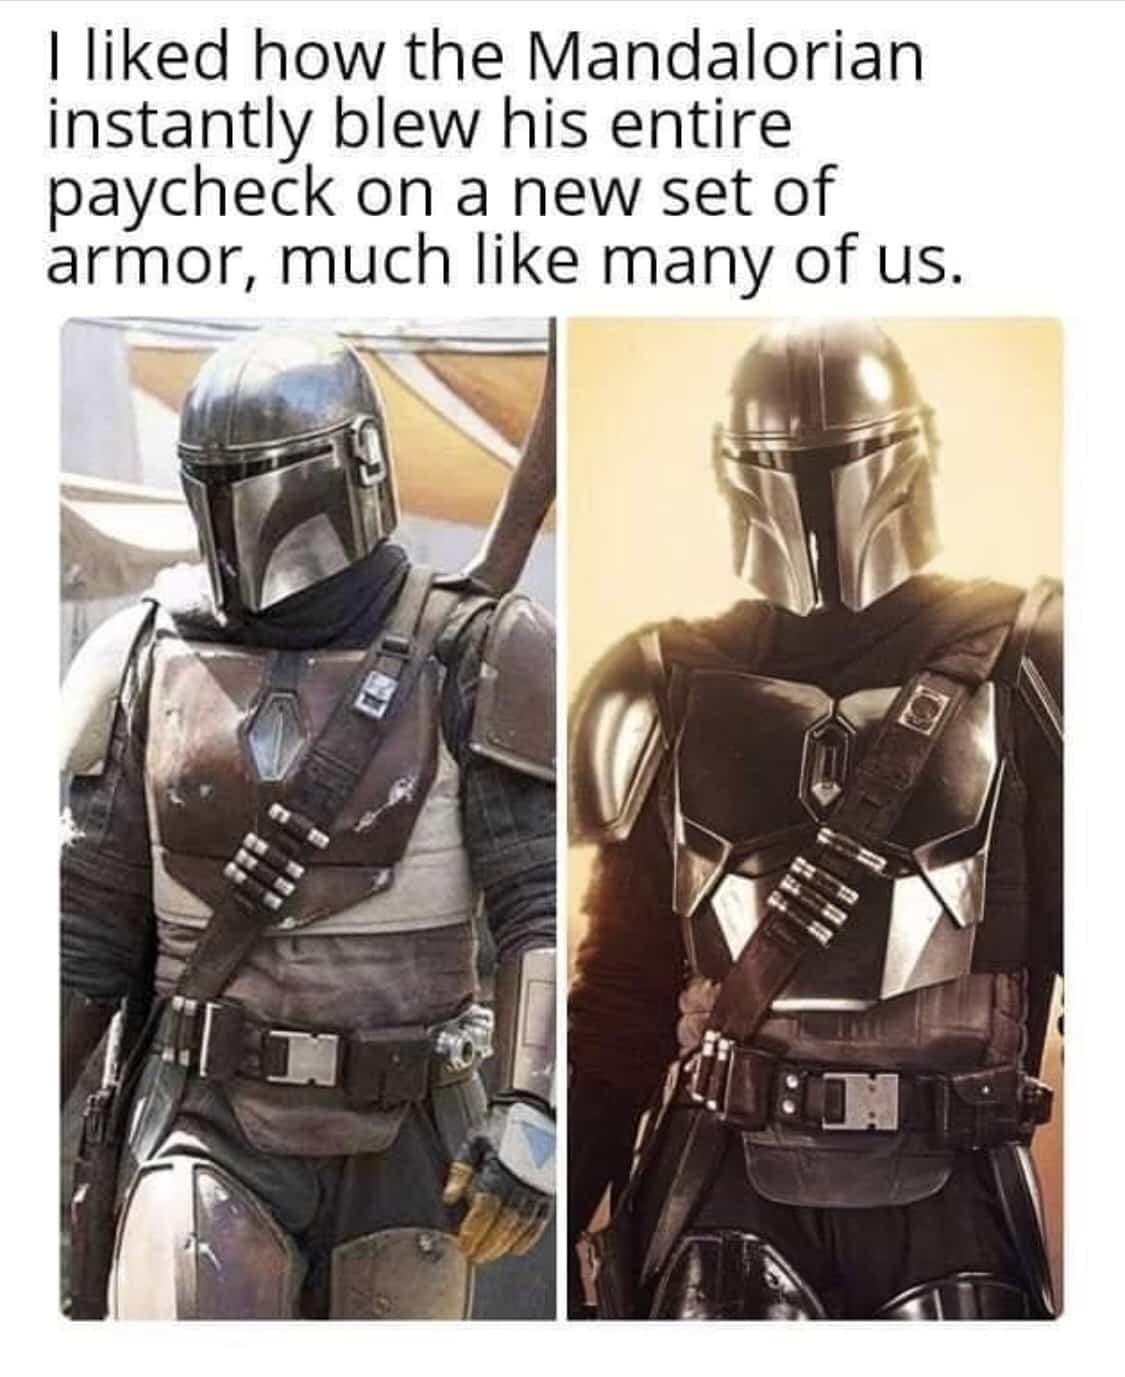 star wars memes, star wars prequel memes, prequel memes, rise of skywalker memes, last jedi memes, force awakens memes, mandalorian memes, funny star wars memes, star.wars memes, star wars meme, star wars memes funny, mandalorian meme